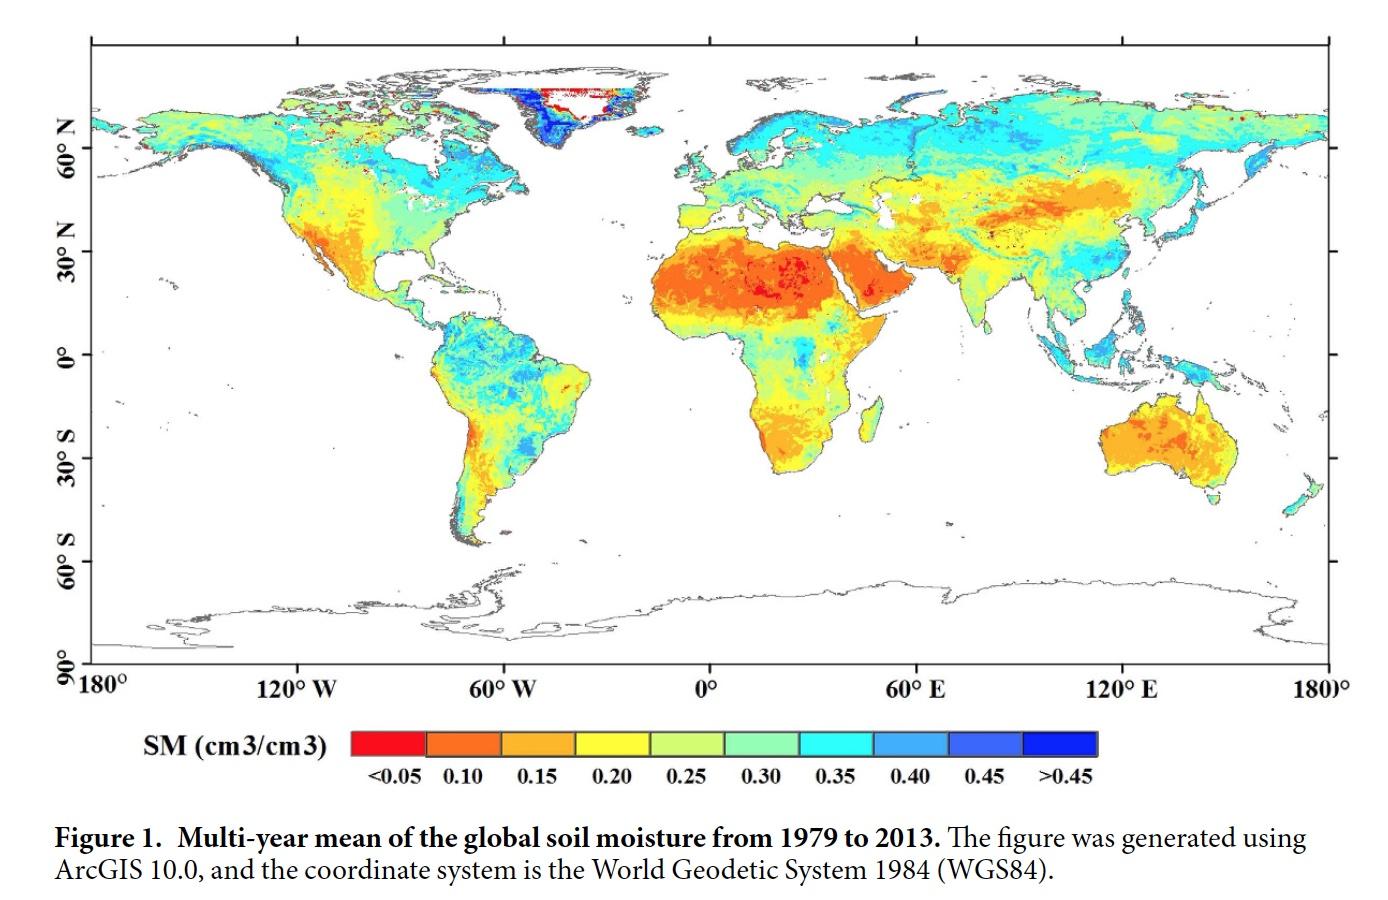 moisture, precipitation, drought, flood, soil